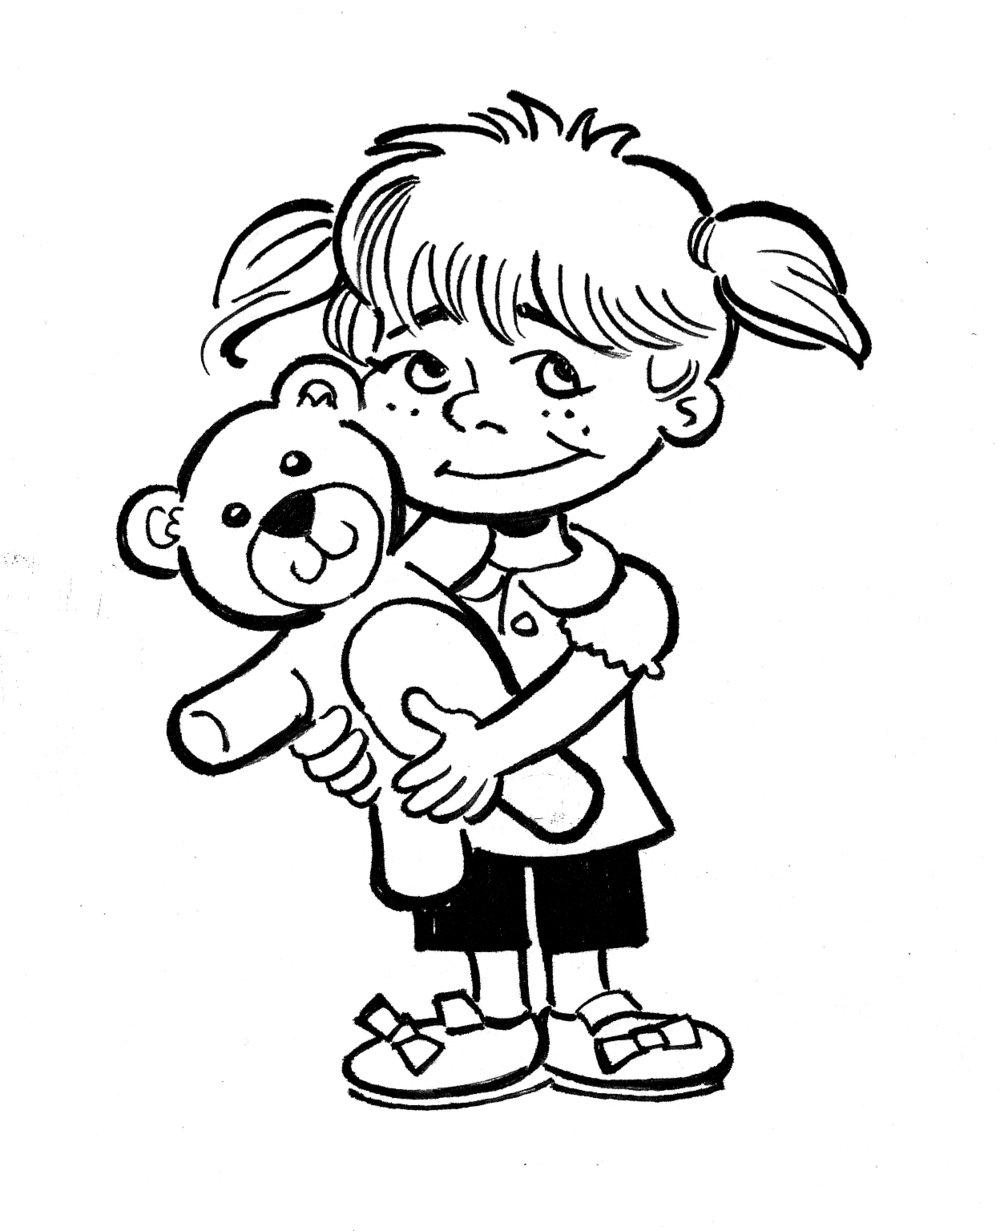 PATH-Teddybear.jpg